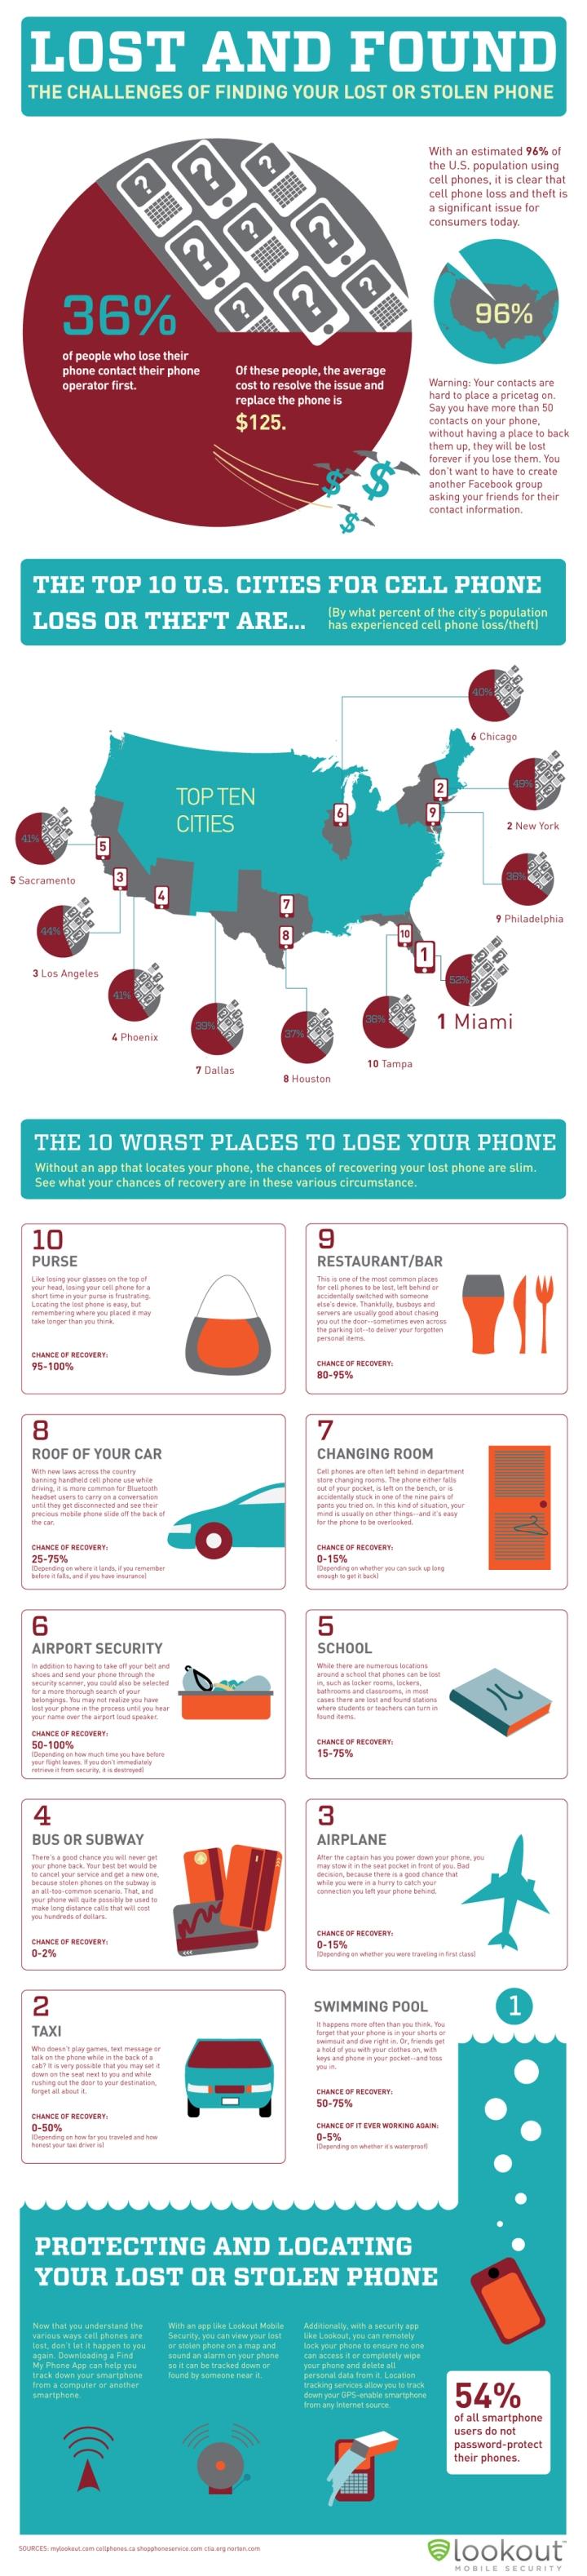 ukradene mobily